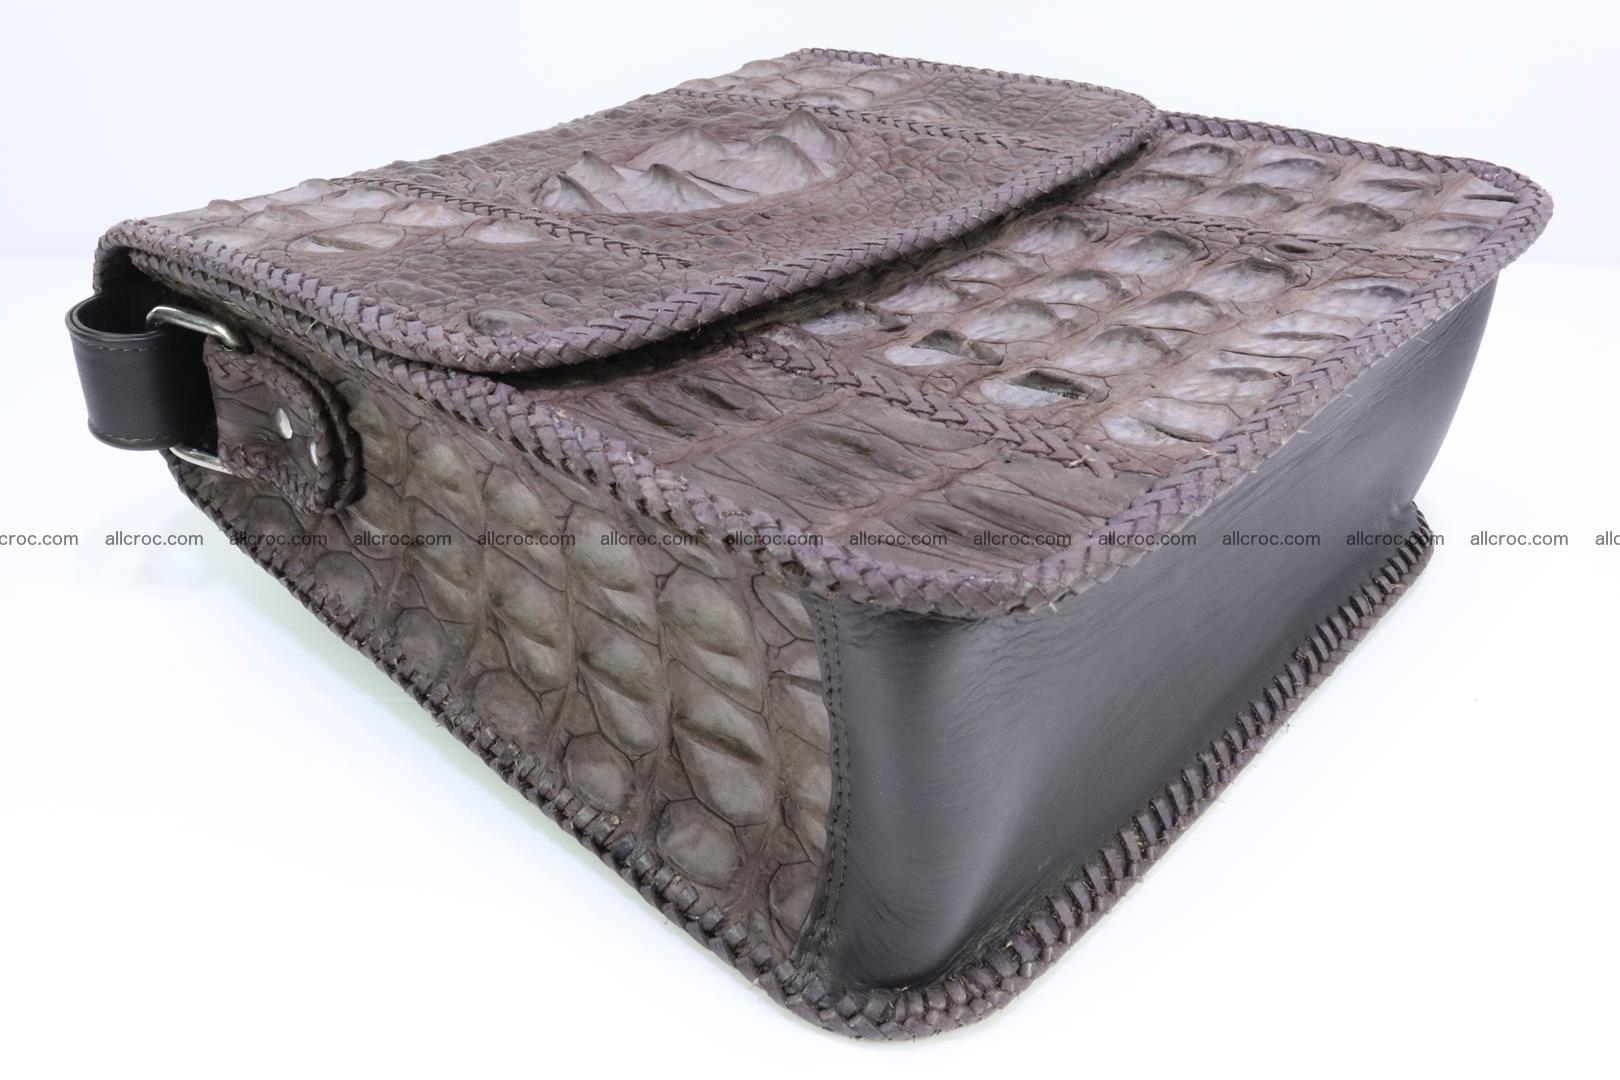 Сrocodile skin shoulder bag with braided edges 142 Foto 9